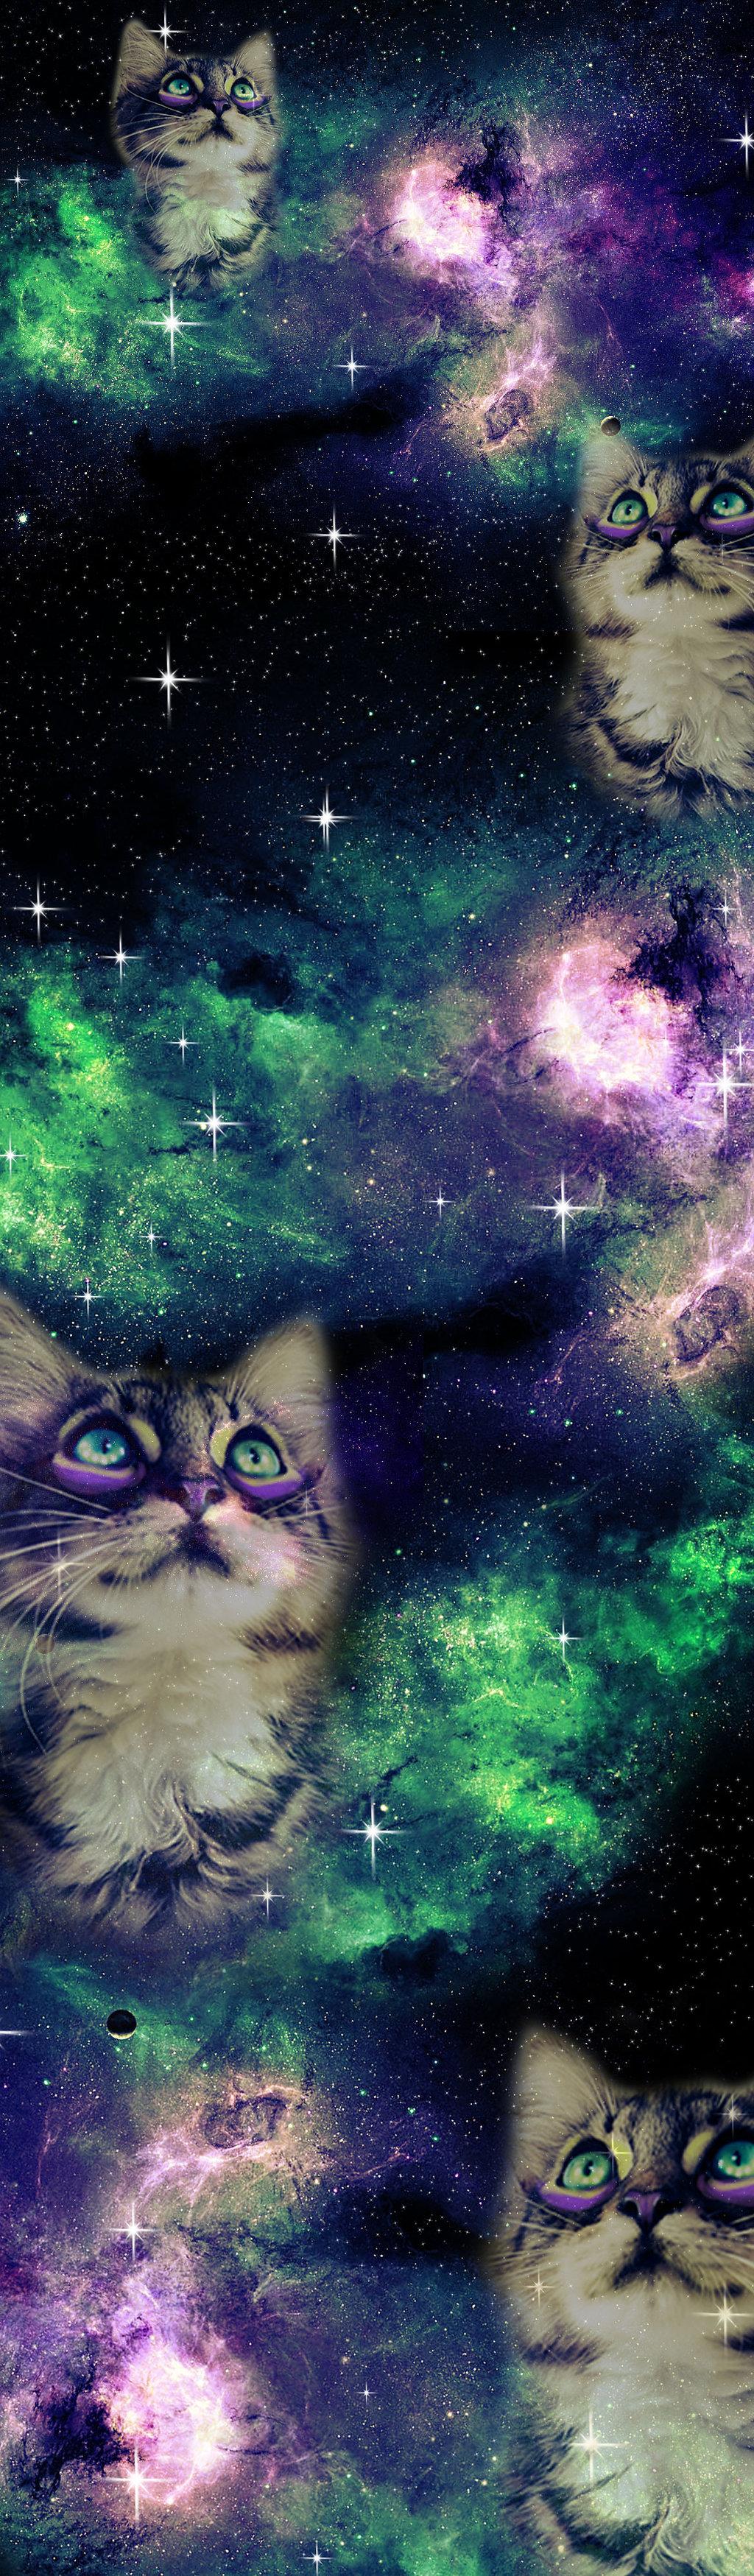 46+] Galaxy Cat Wallpaper Windows 8 on WallpaperSafari